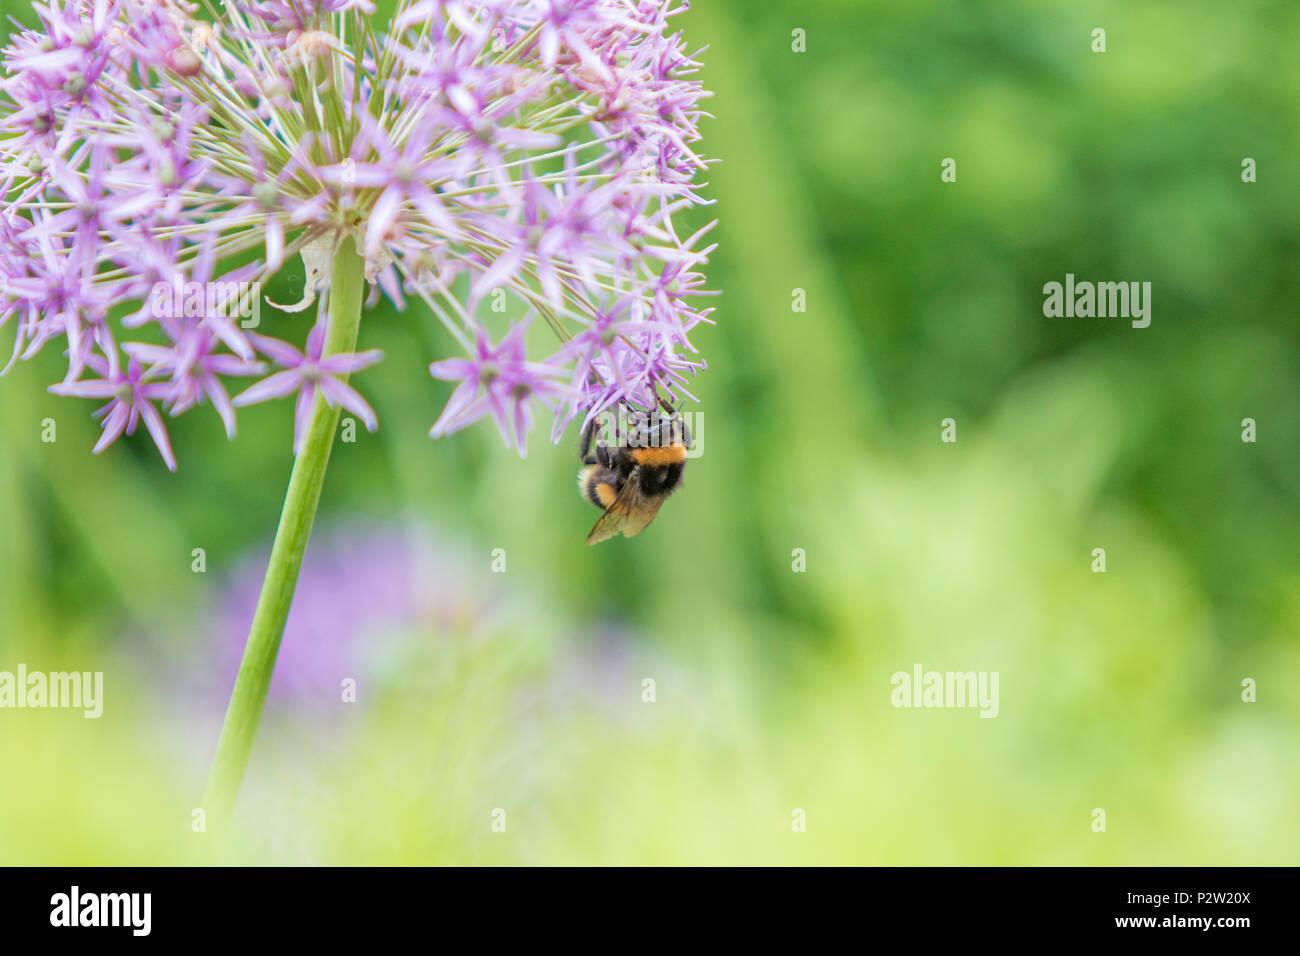 A Bee on a Allium flowerhead. - Stock Image